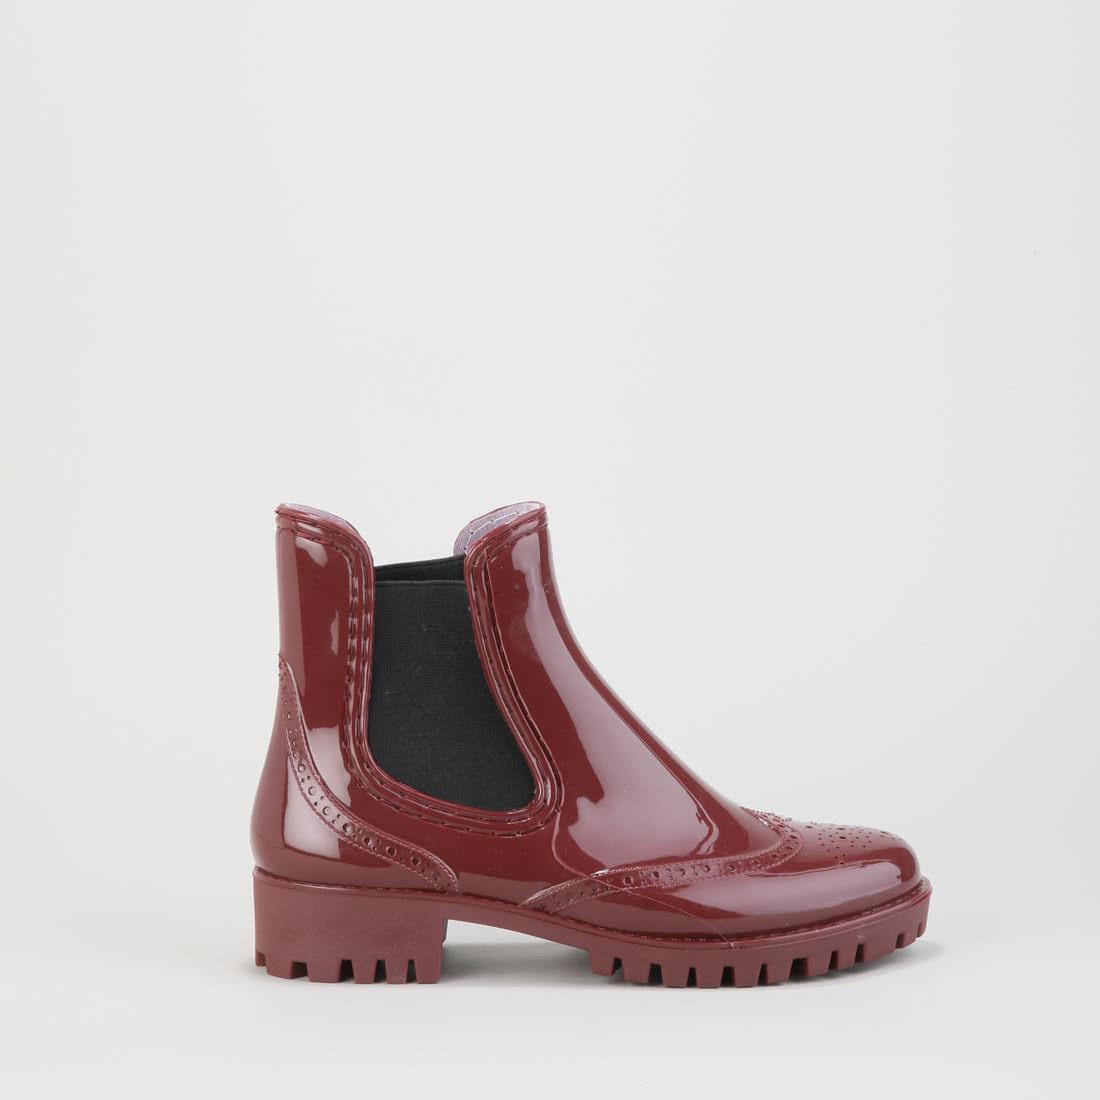 b4834e15f2af76 Chelsea Boot Gummistiefel rot online kaufen